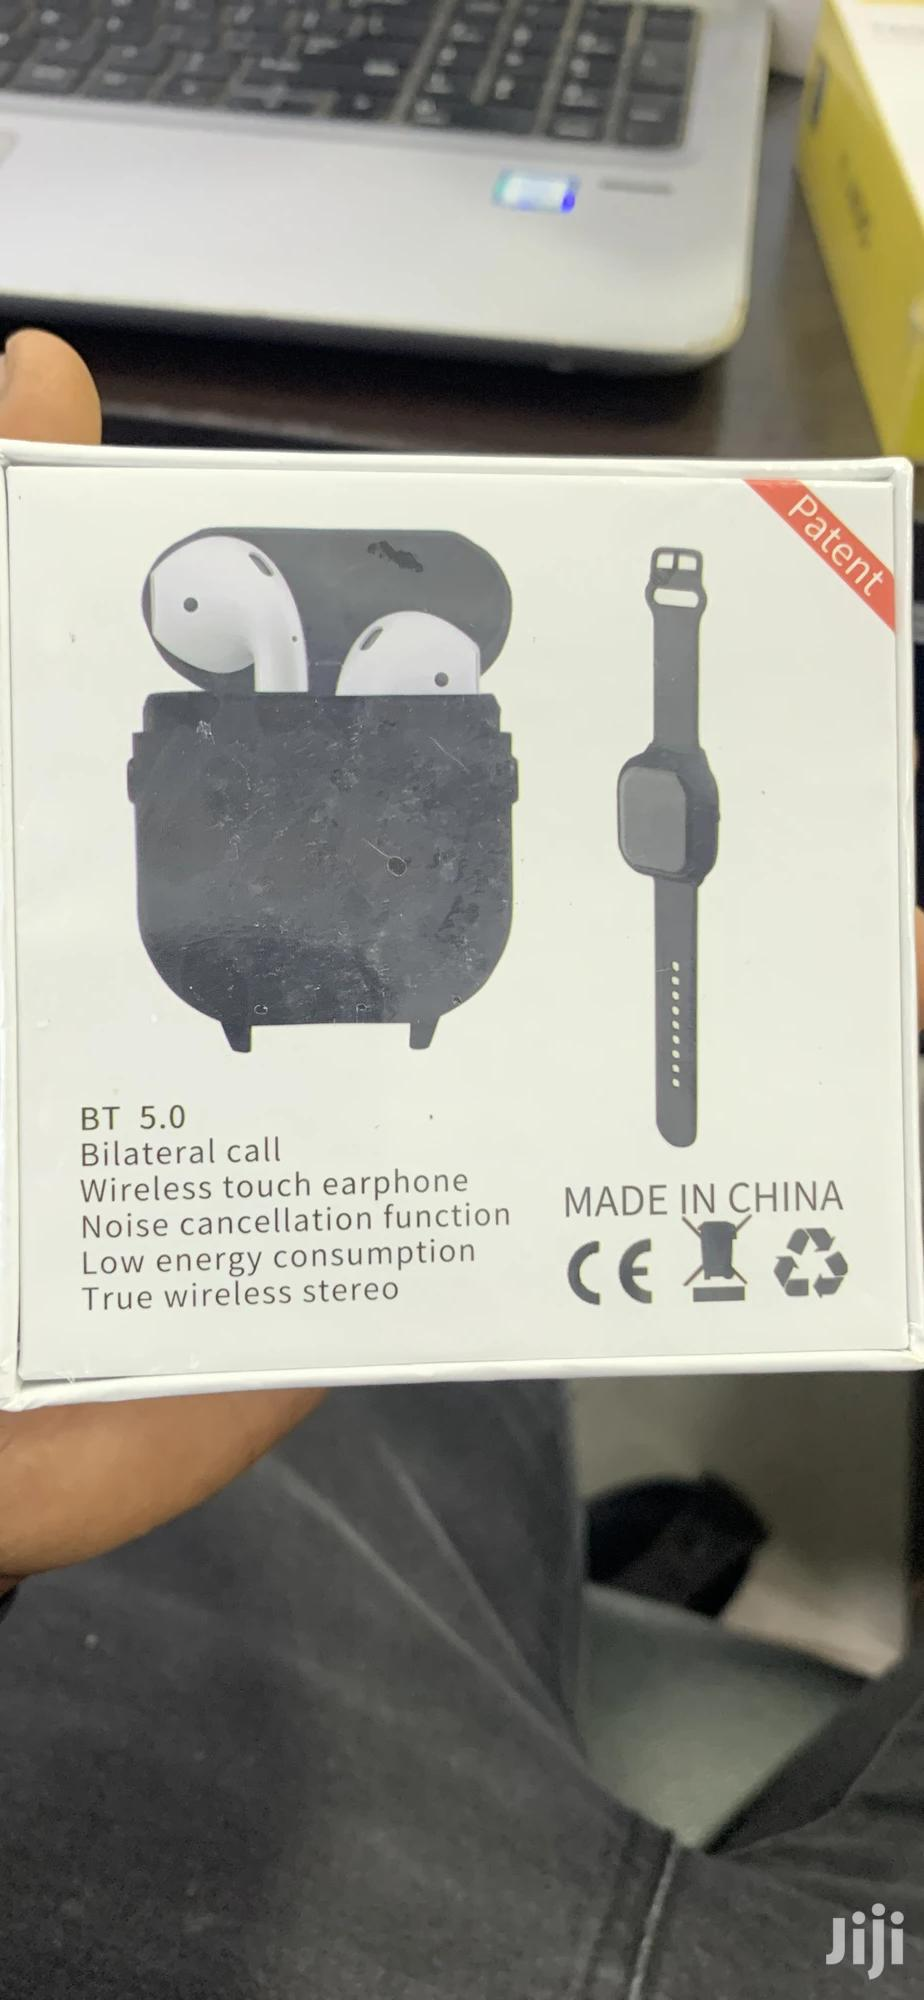 A01 Tws Earbuds | Headphones for sale in Kampala, Central Region, Uganda